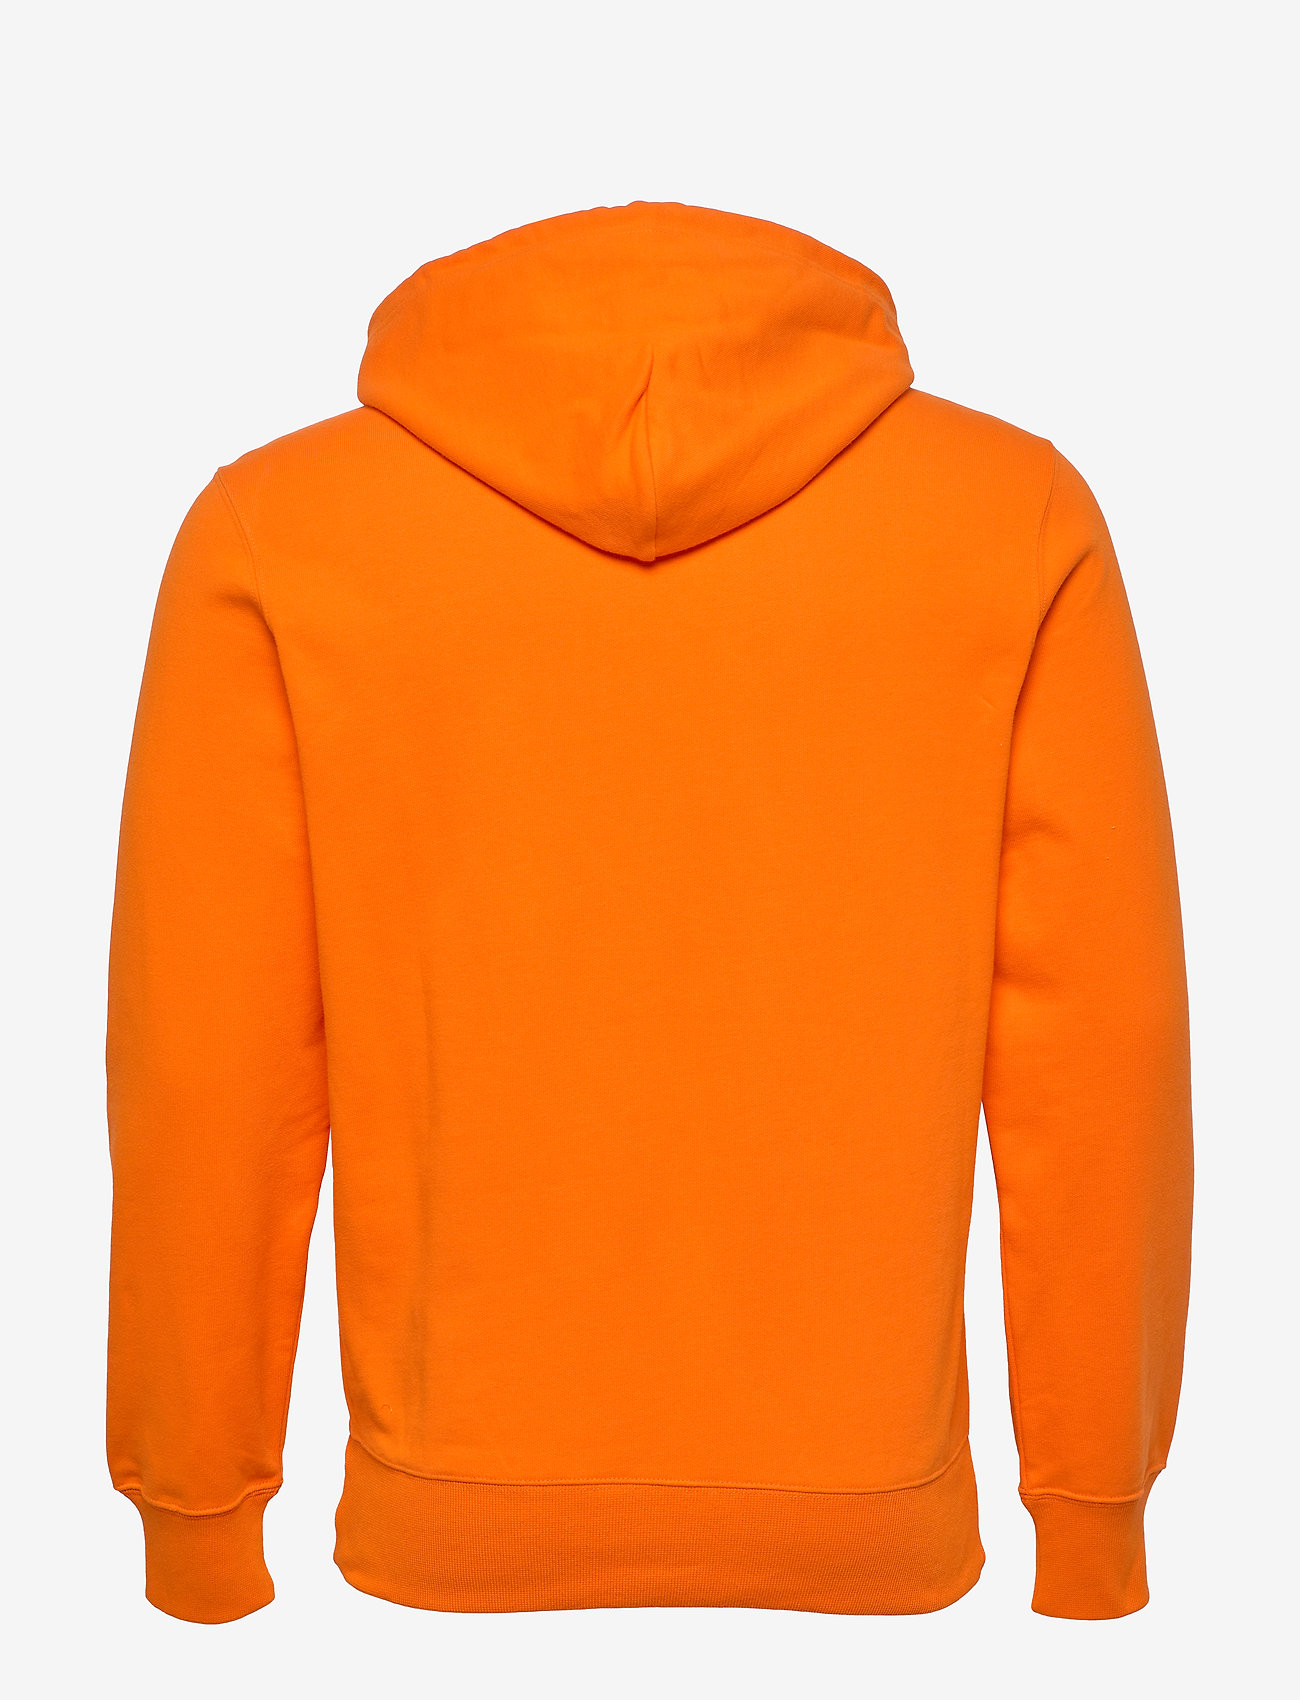 Champion Hooded Sweatshirt - Sweatshirts EXUBERANCE - Menn Klær